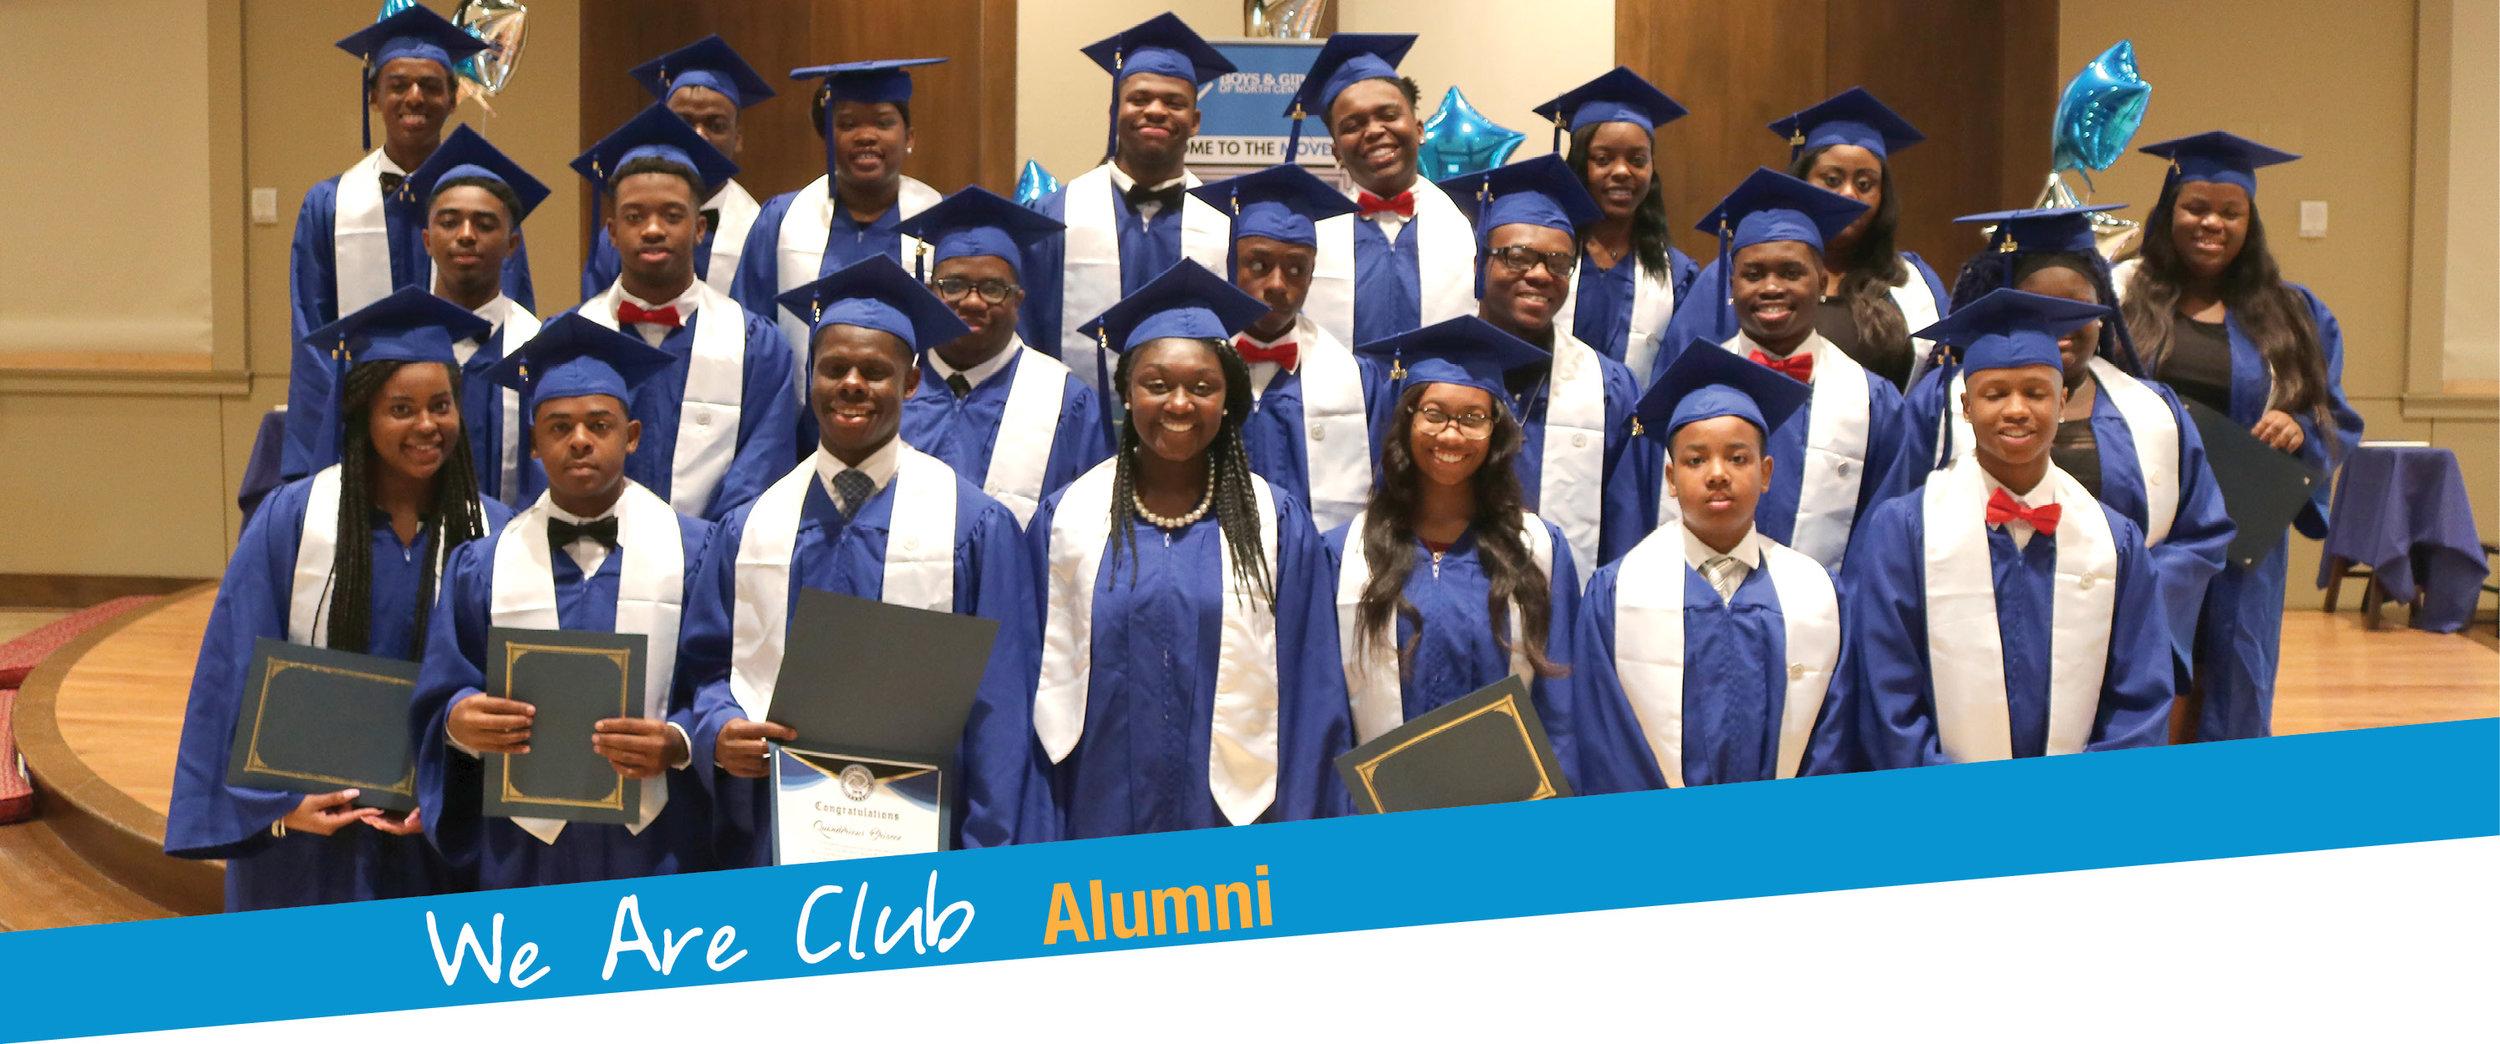 Club Alumni Header photo 4.jpg